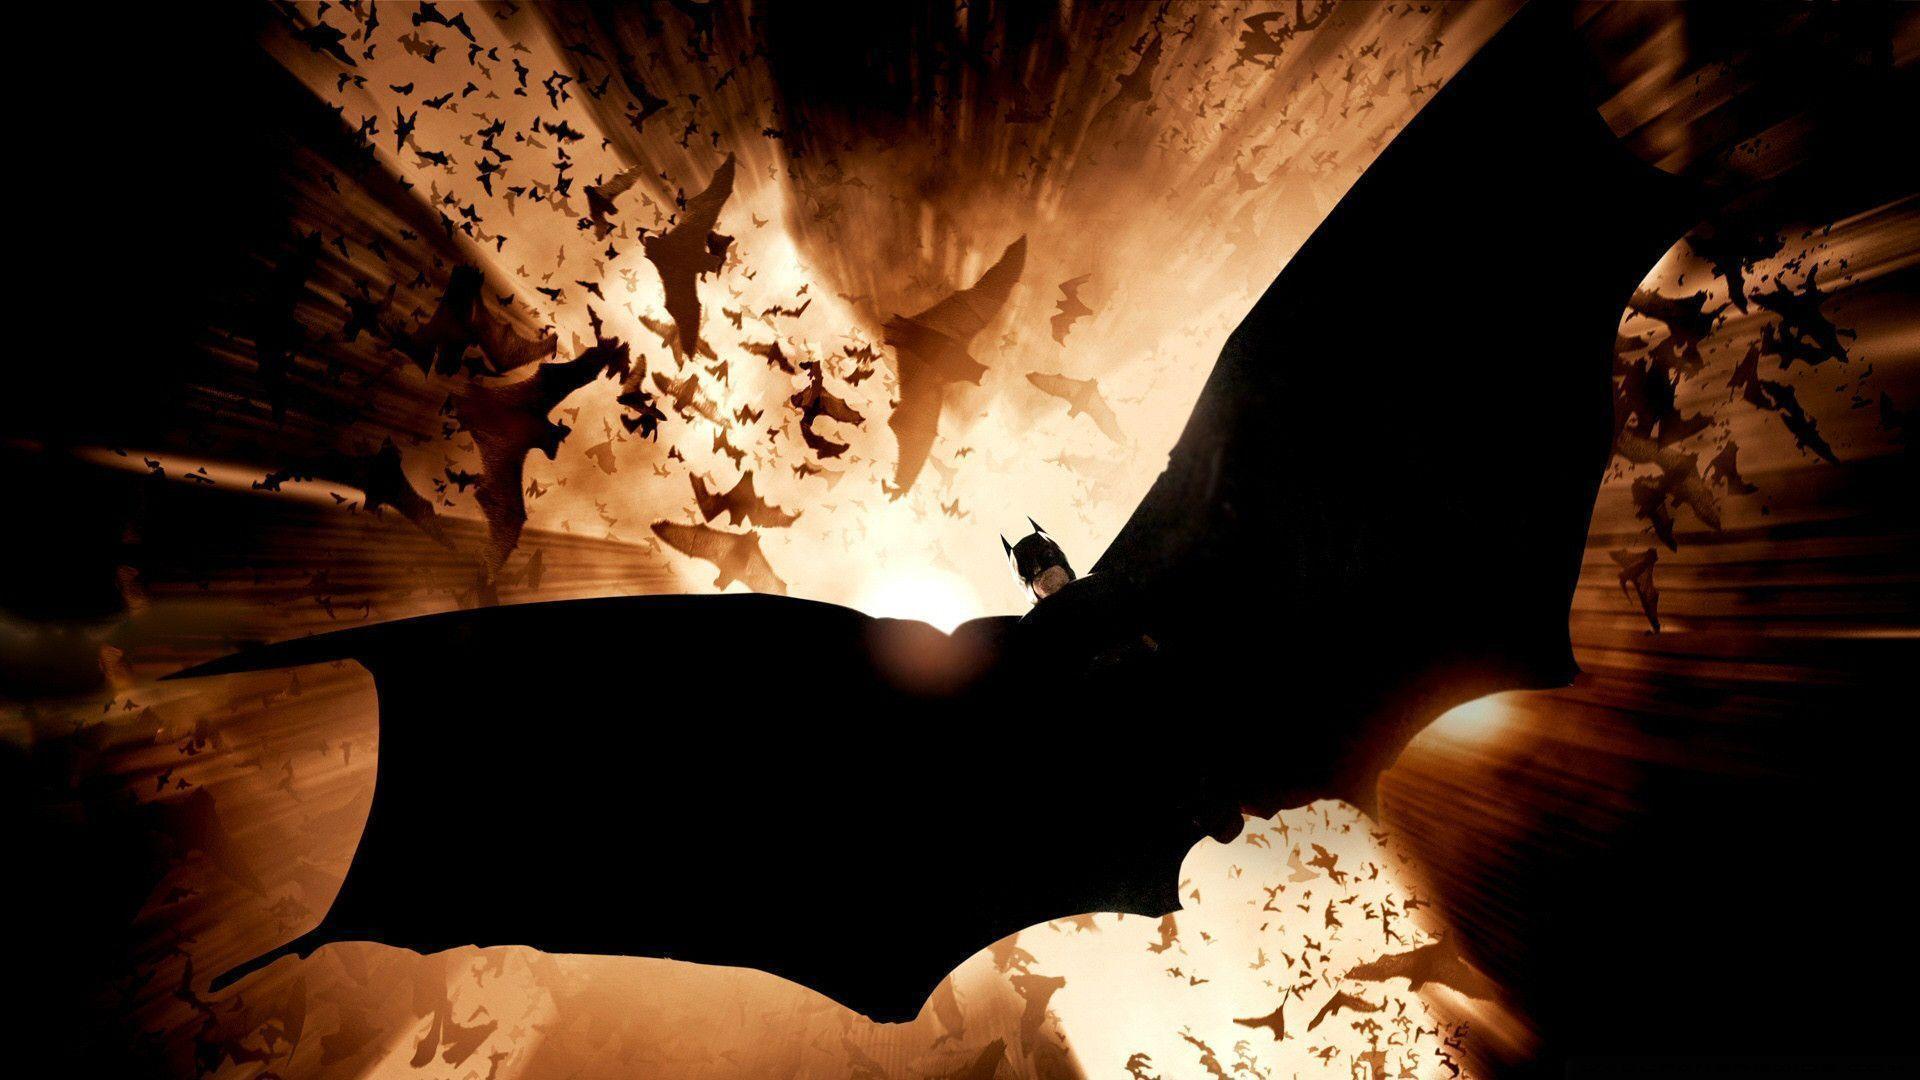 2012 Batman Movie Wallpapers | HD Wallpapers